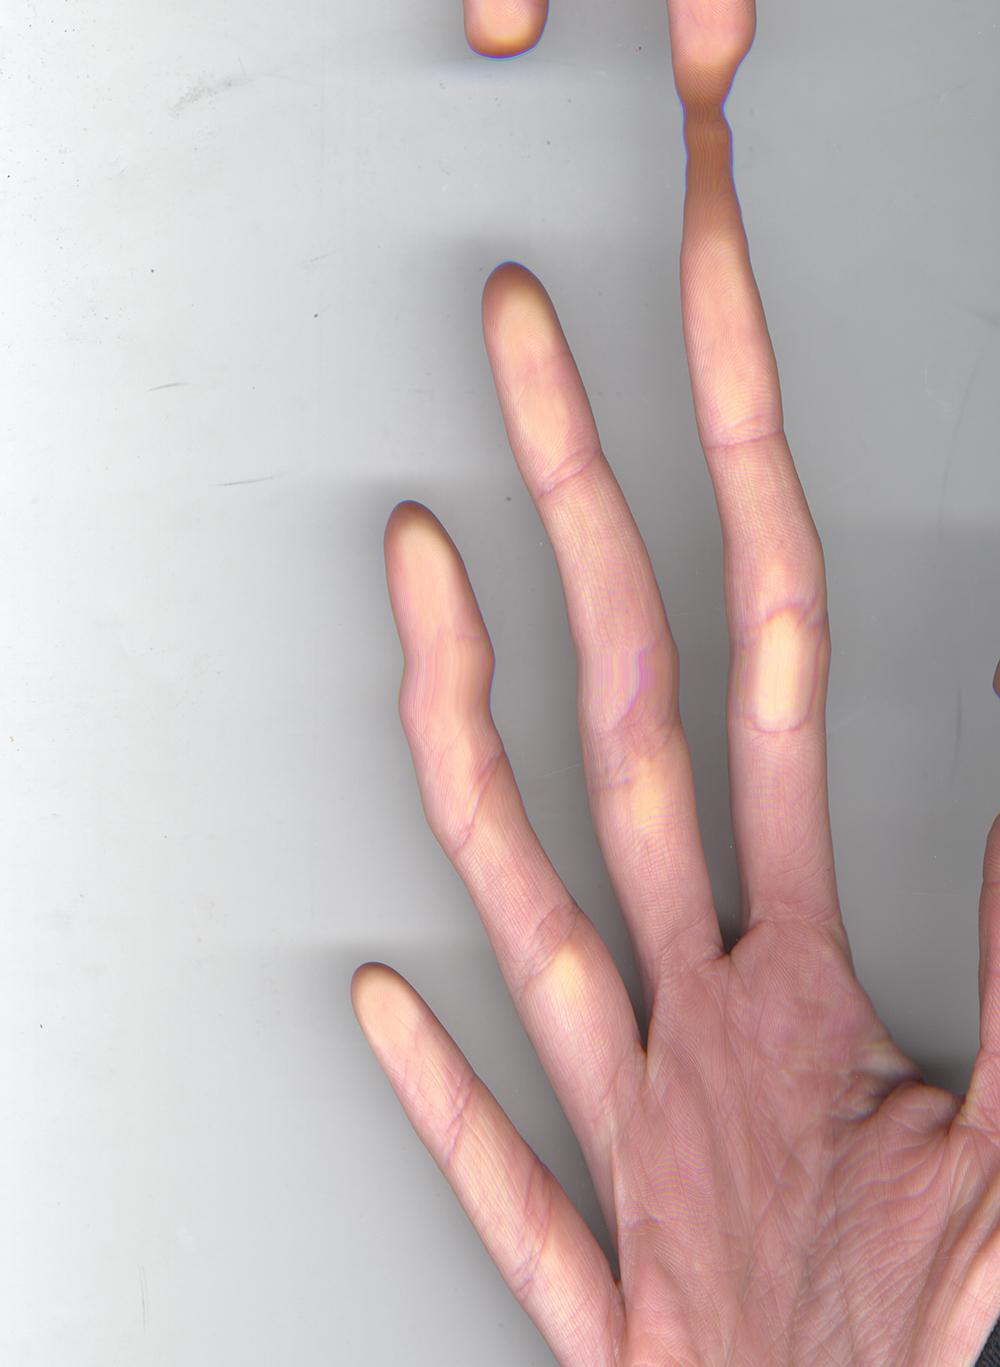 Phil's hand